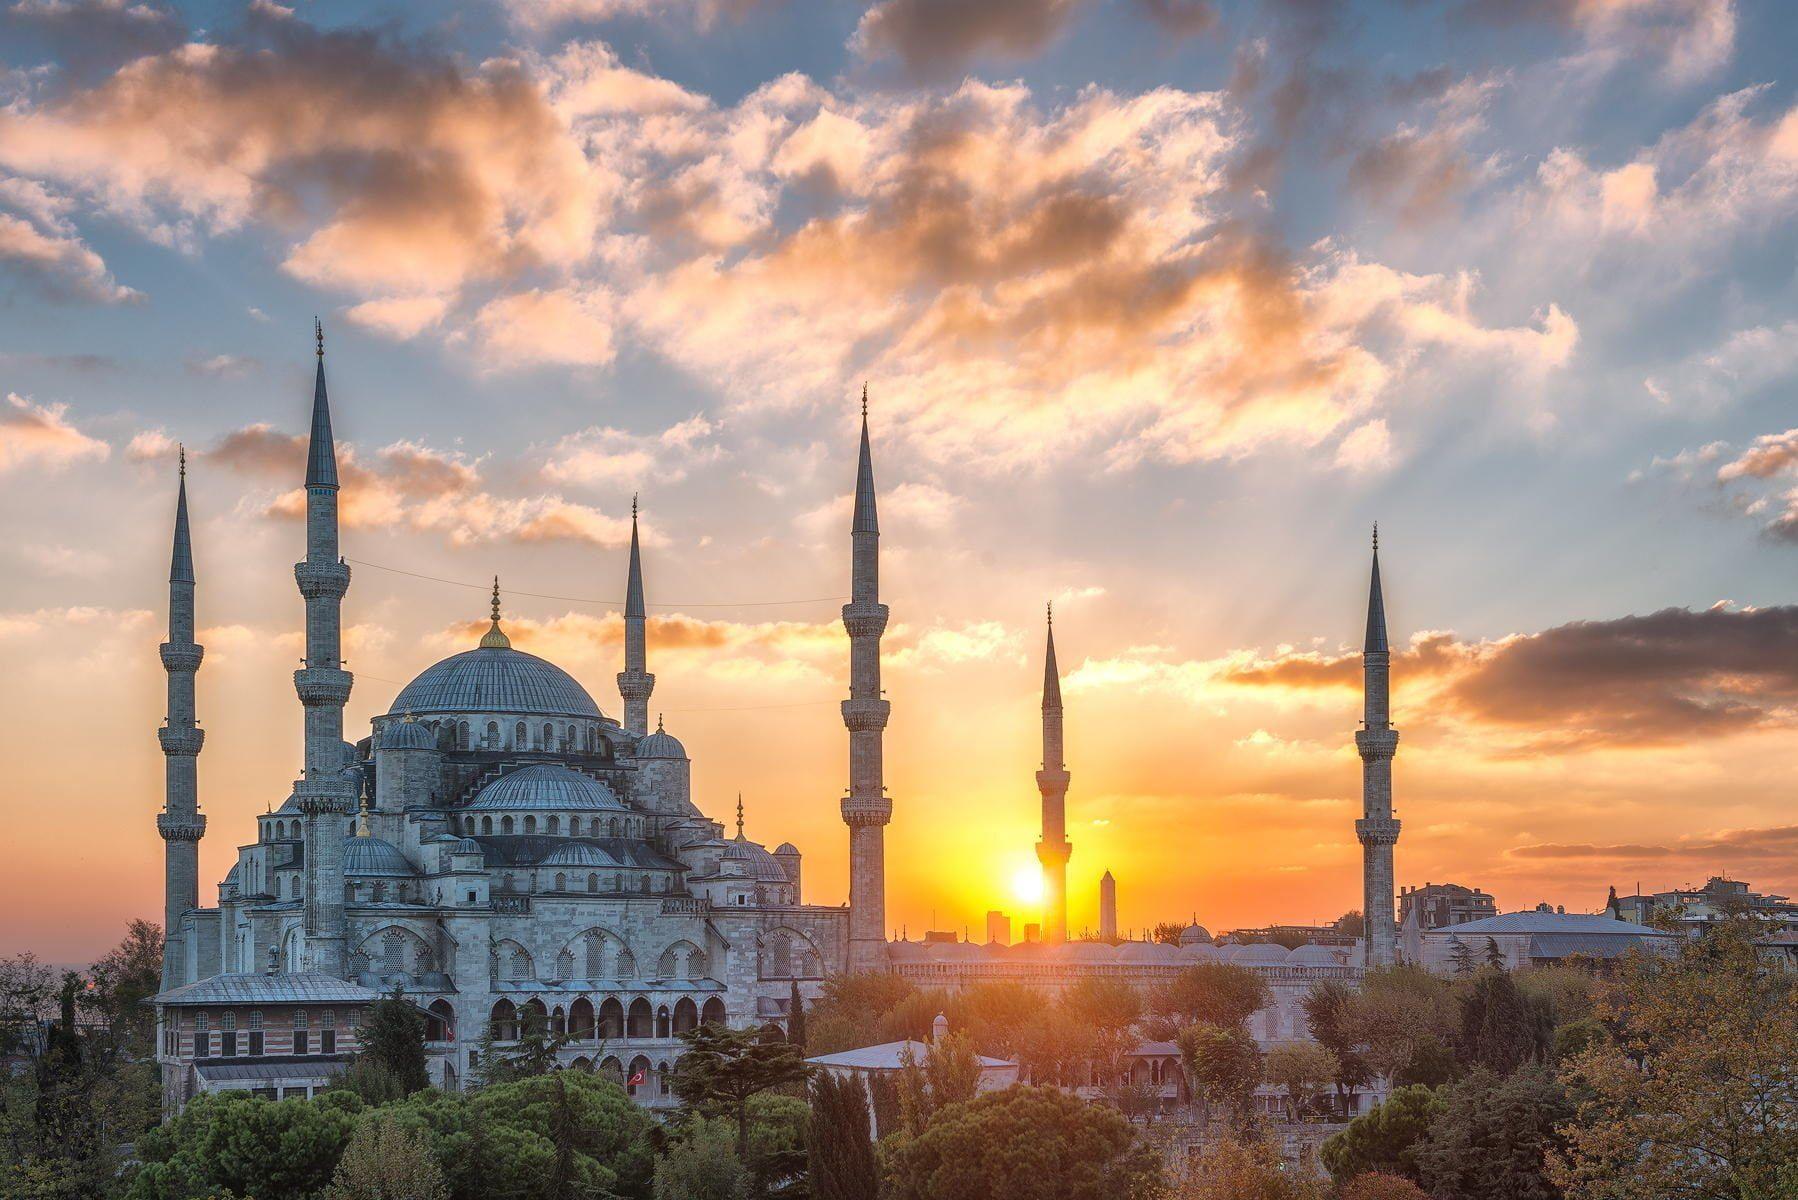 Mosques Sultan Ahmed Mosque Cloud Istanbul Morning Mosque Turkey 720p Wallpaper Hdwallpaper Deskt Blue Mosque Istanbul Blue Mosque Blue Mosque Turkey